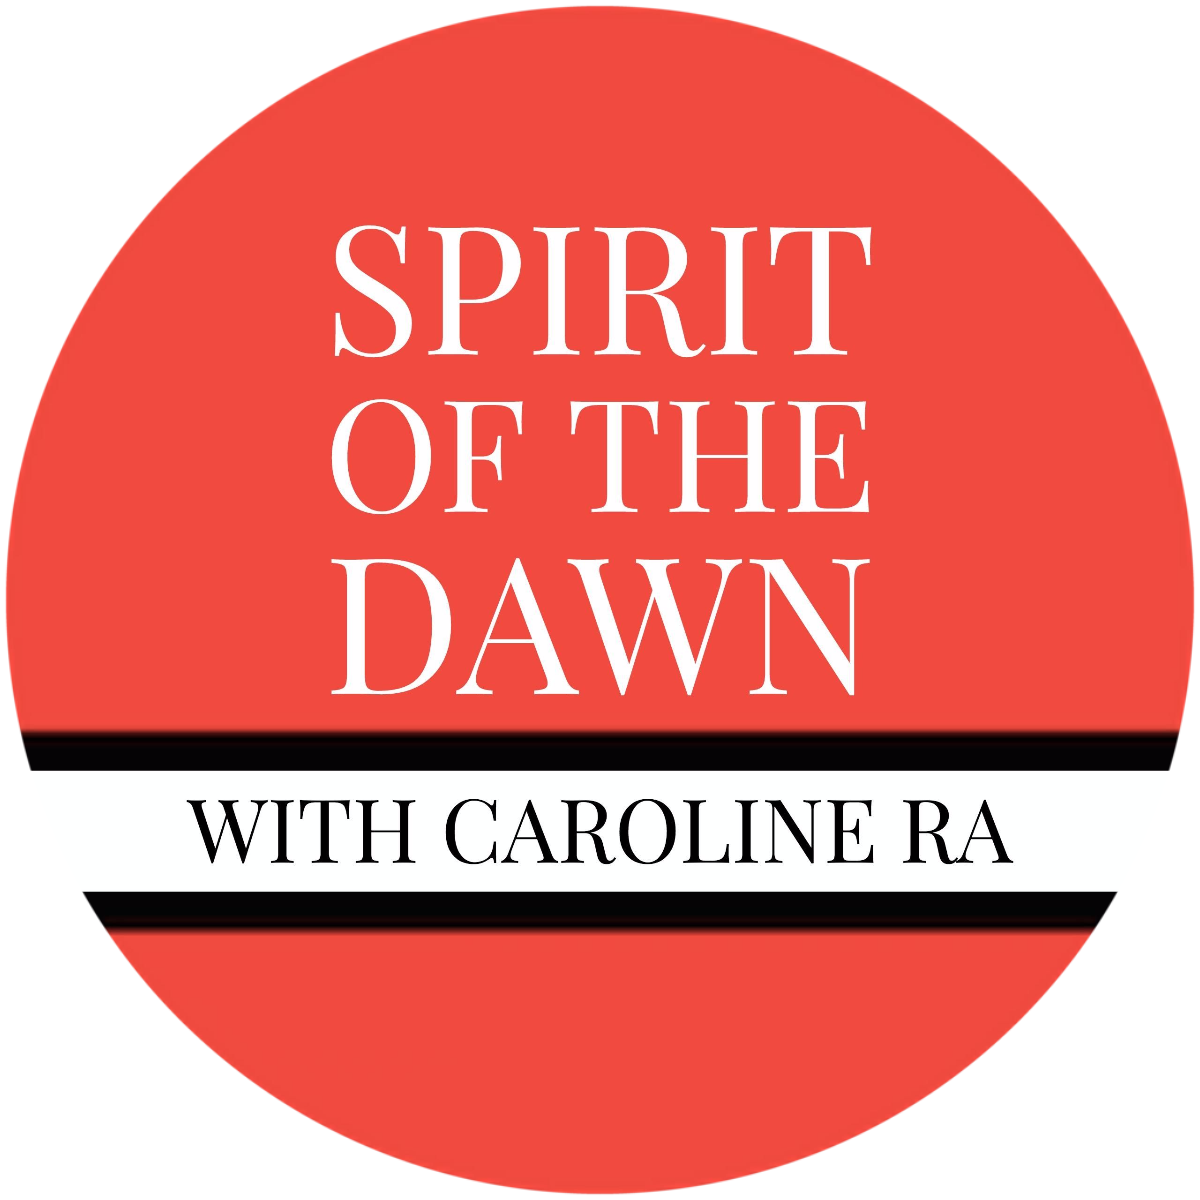 Spirit of the Dawn with Caroline Ra